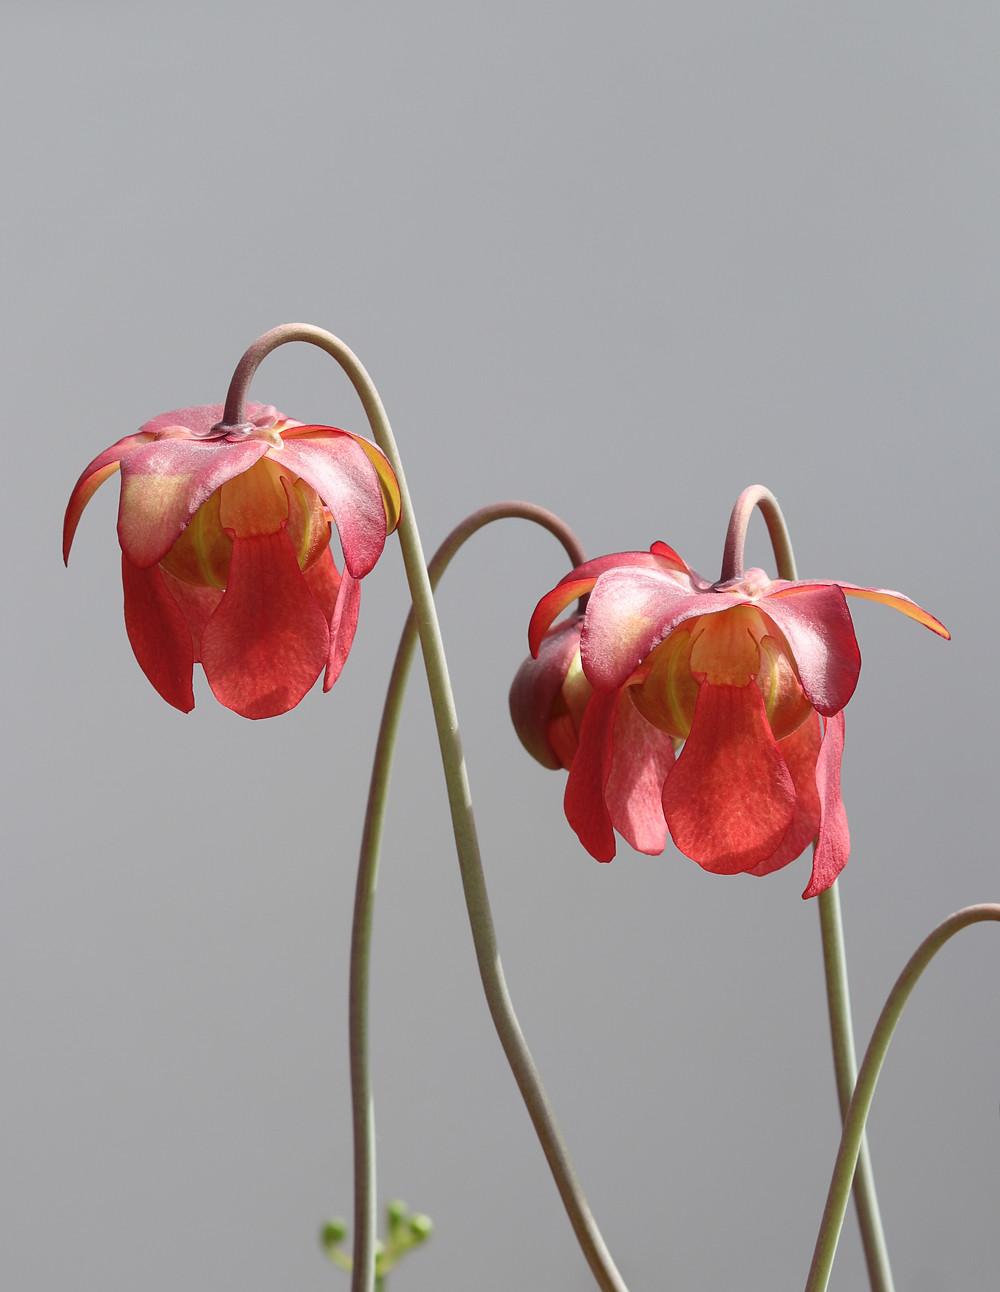 sarracenia red flowers and petals